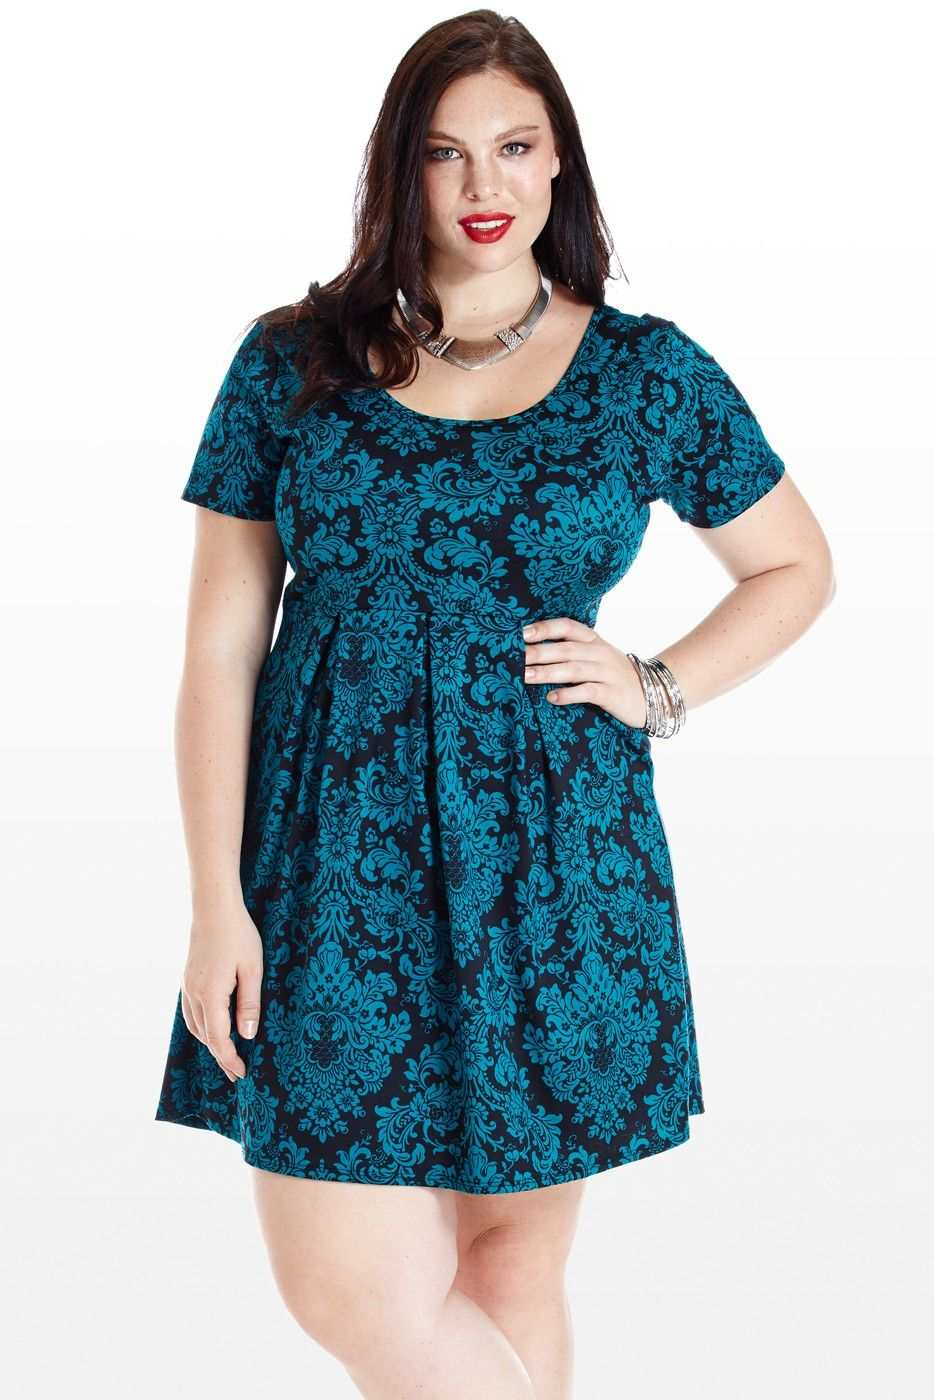 Scroll and Key Plus Size Babydoll Dress | FATshionistas - Plus Size ...